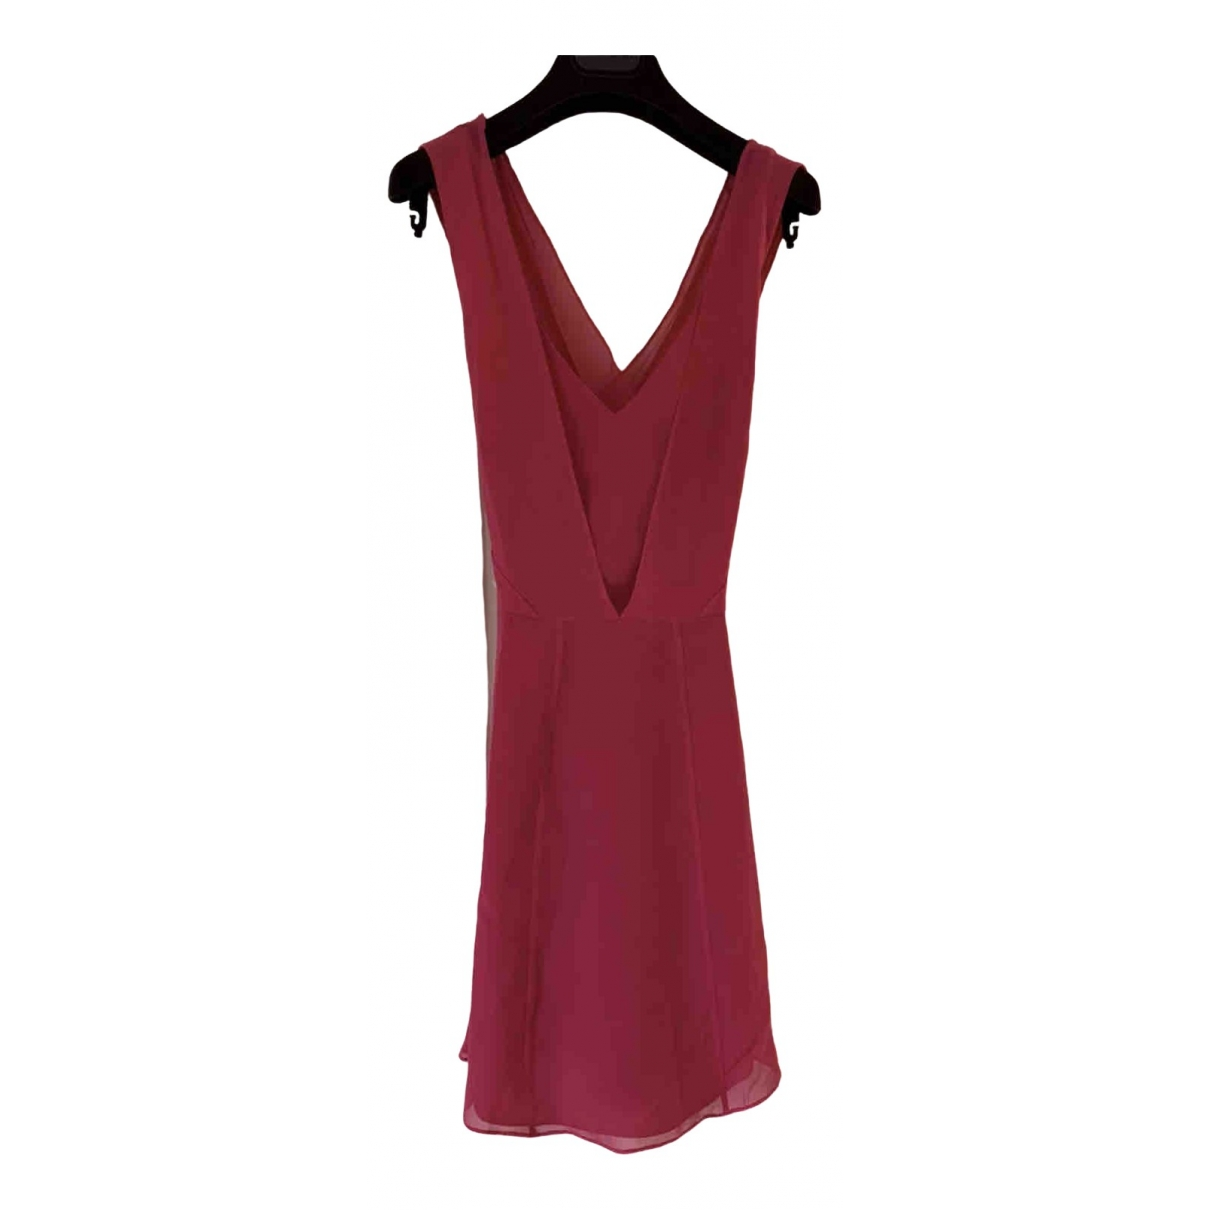 Reiss \N Pink Silk dress for Women 10 UK